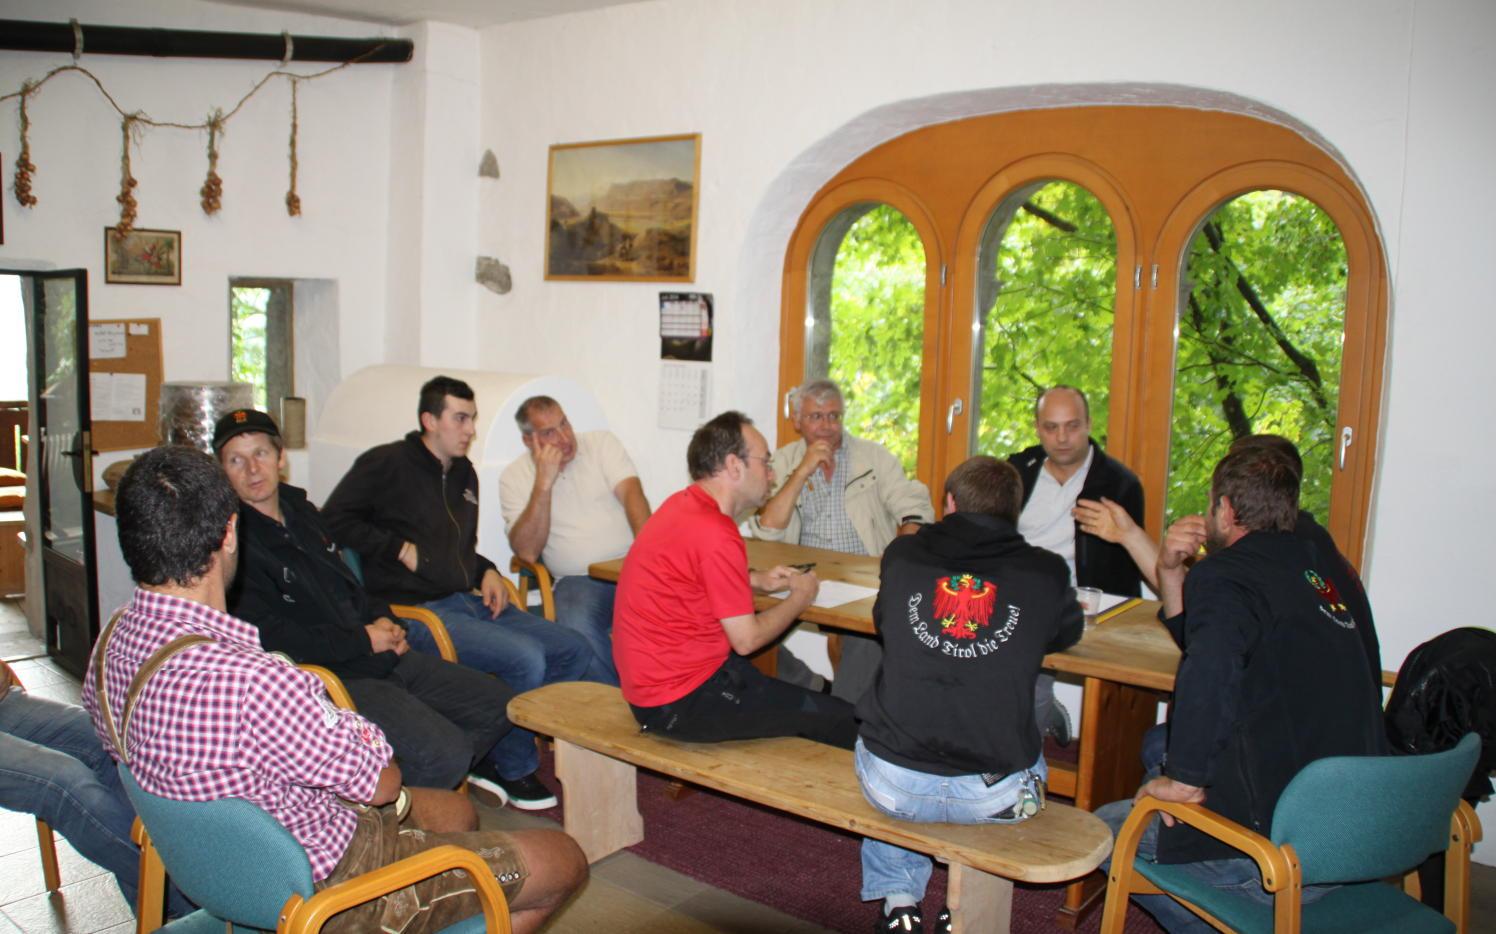 2014_Brunnenburg Dorf Tirol Bezirk_Bezirksklausur Offen Gredt 4